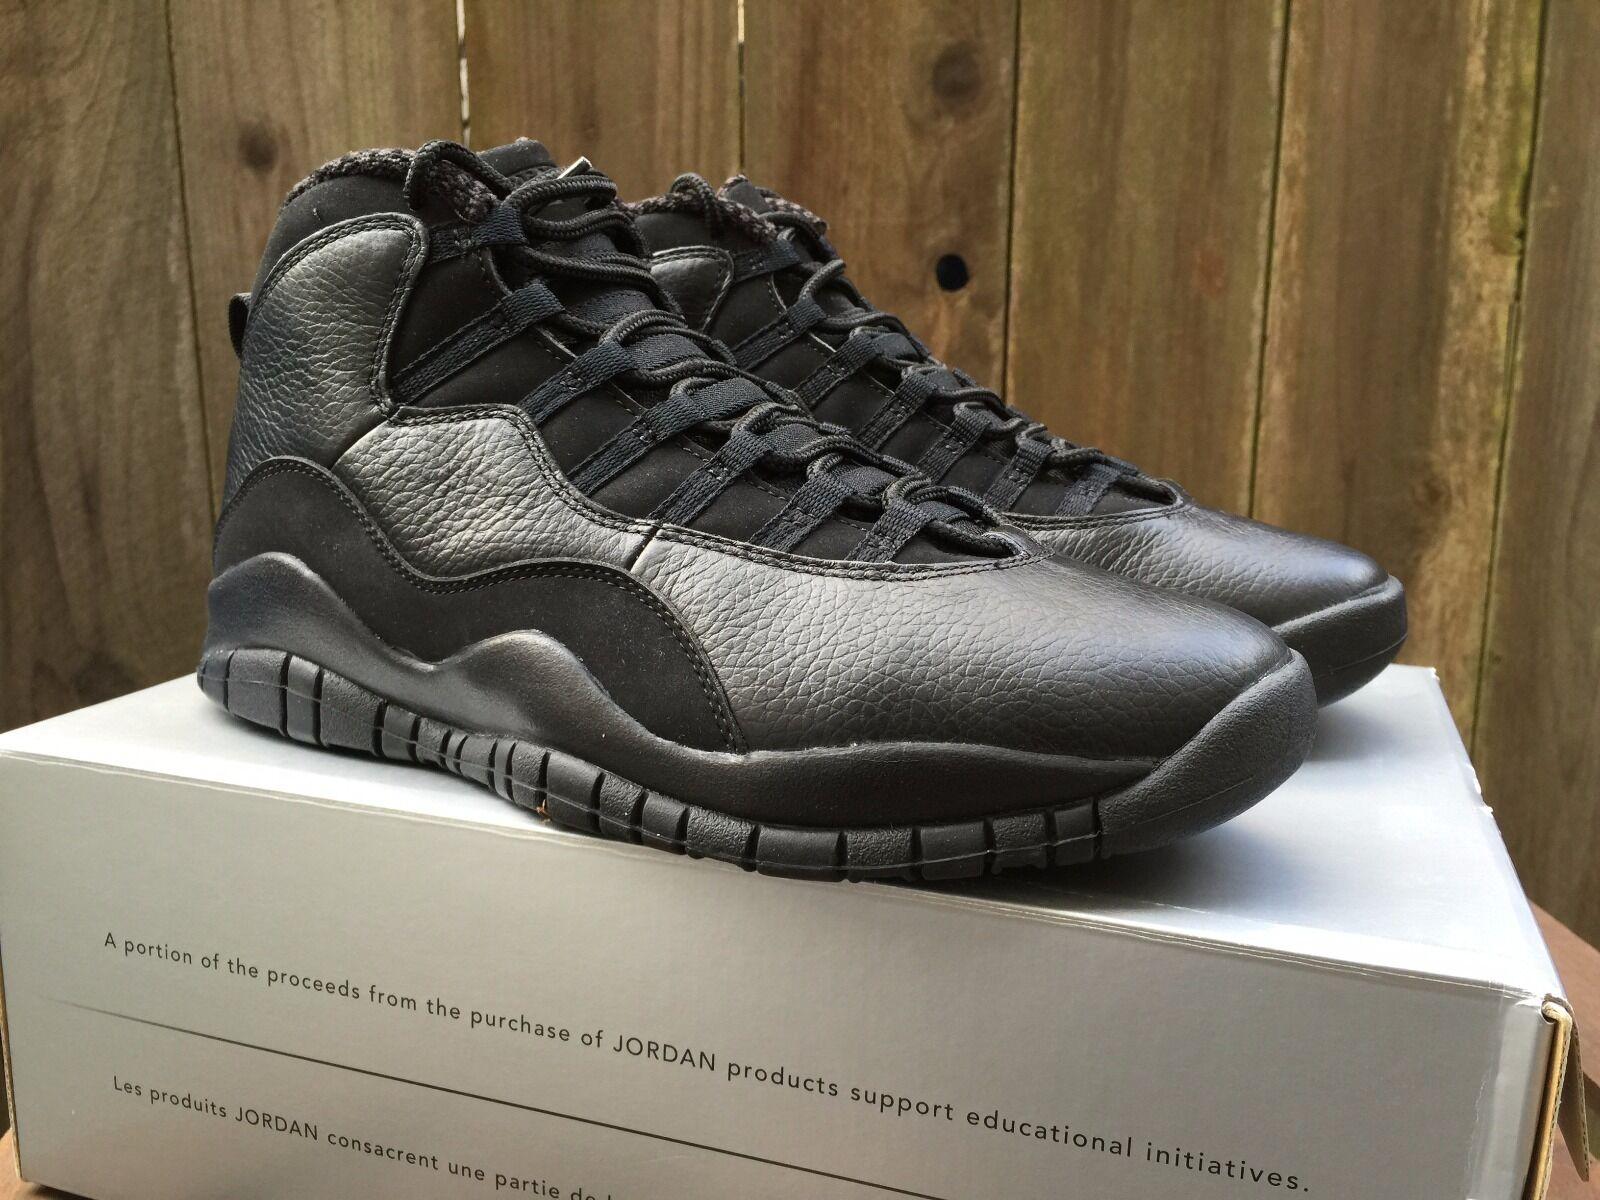 RARE DS Nike AIR JORDAN 10 X Retro sz10 2005 310805 010 Black Cat   Stealth kobe